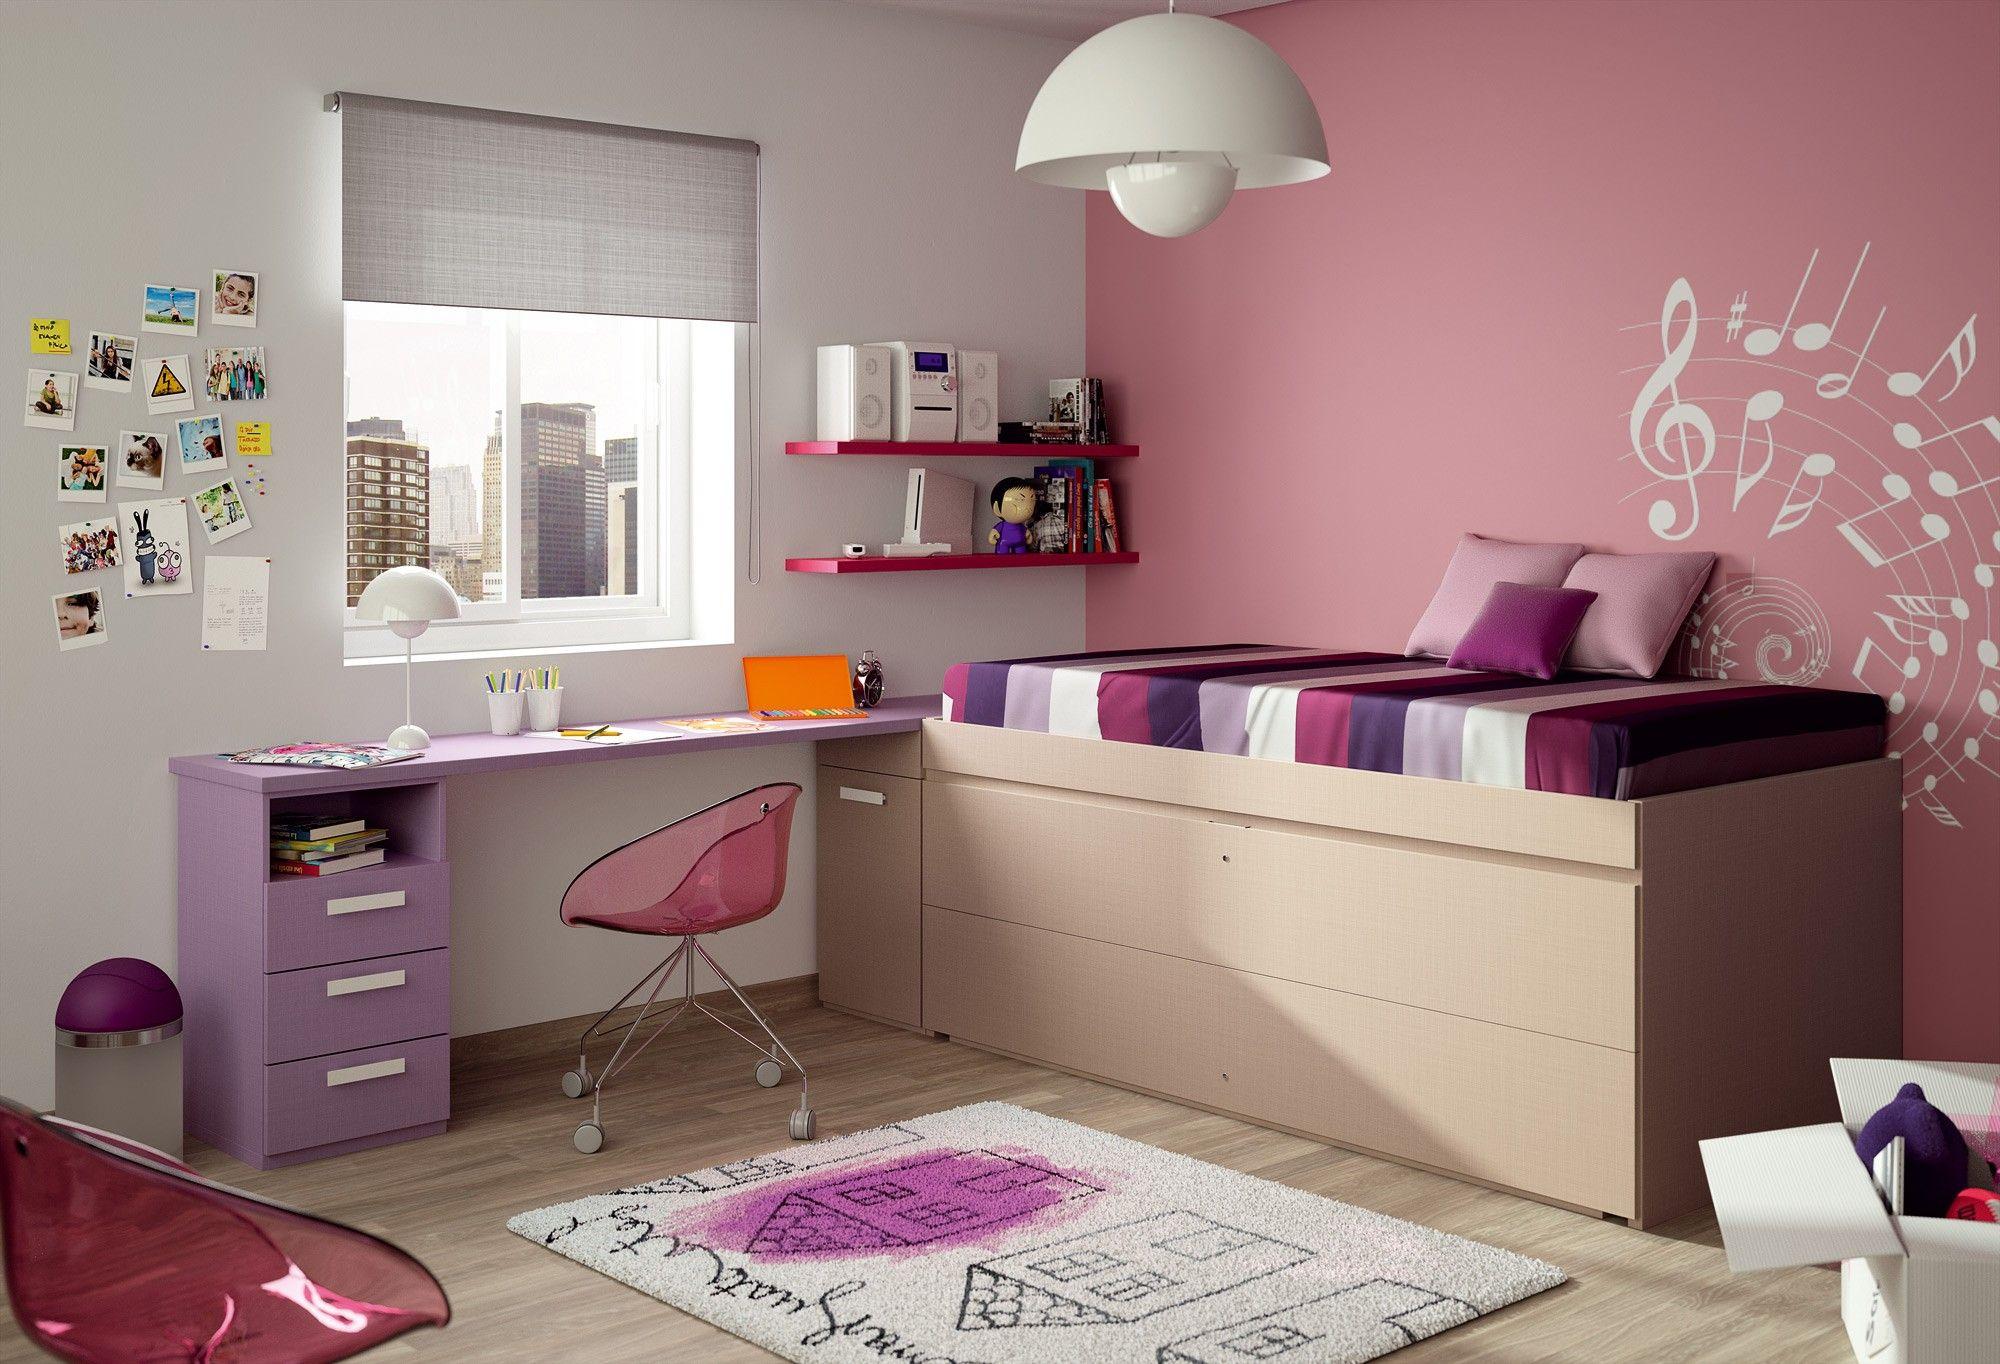 Cool Beds For Teens | Teenage Girl Bedroom Ideas